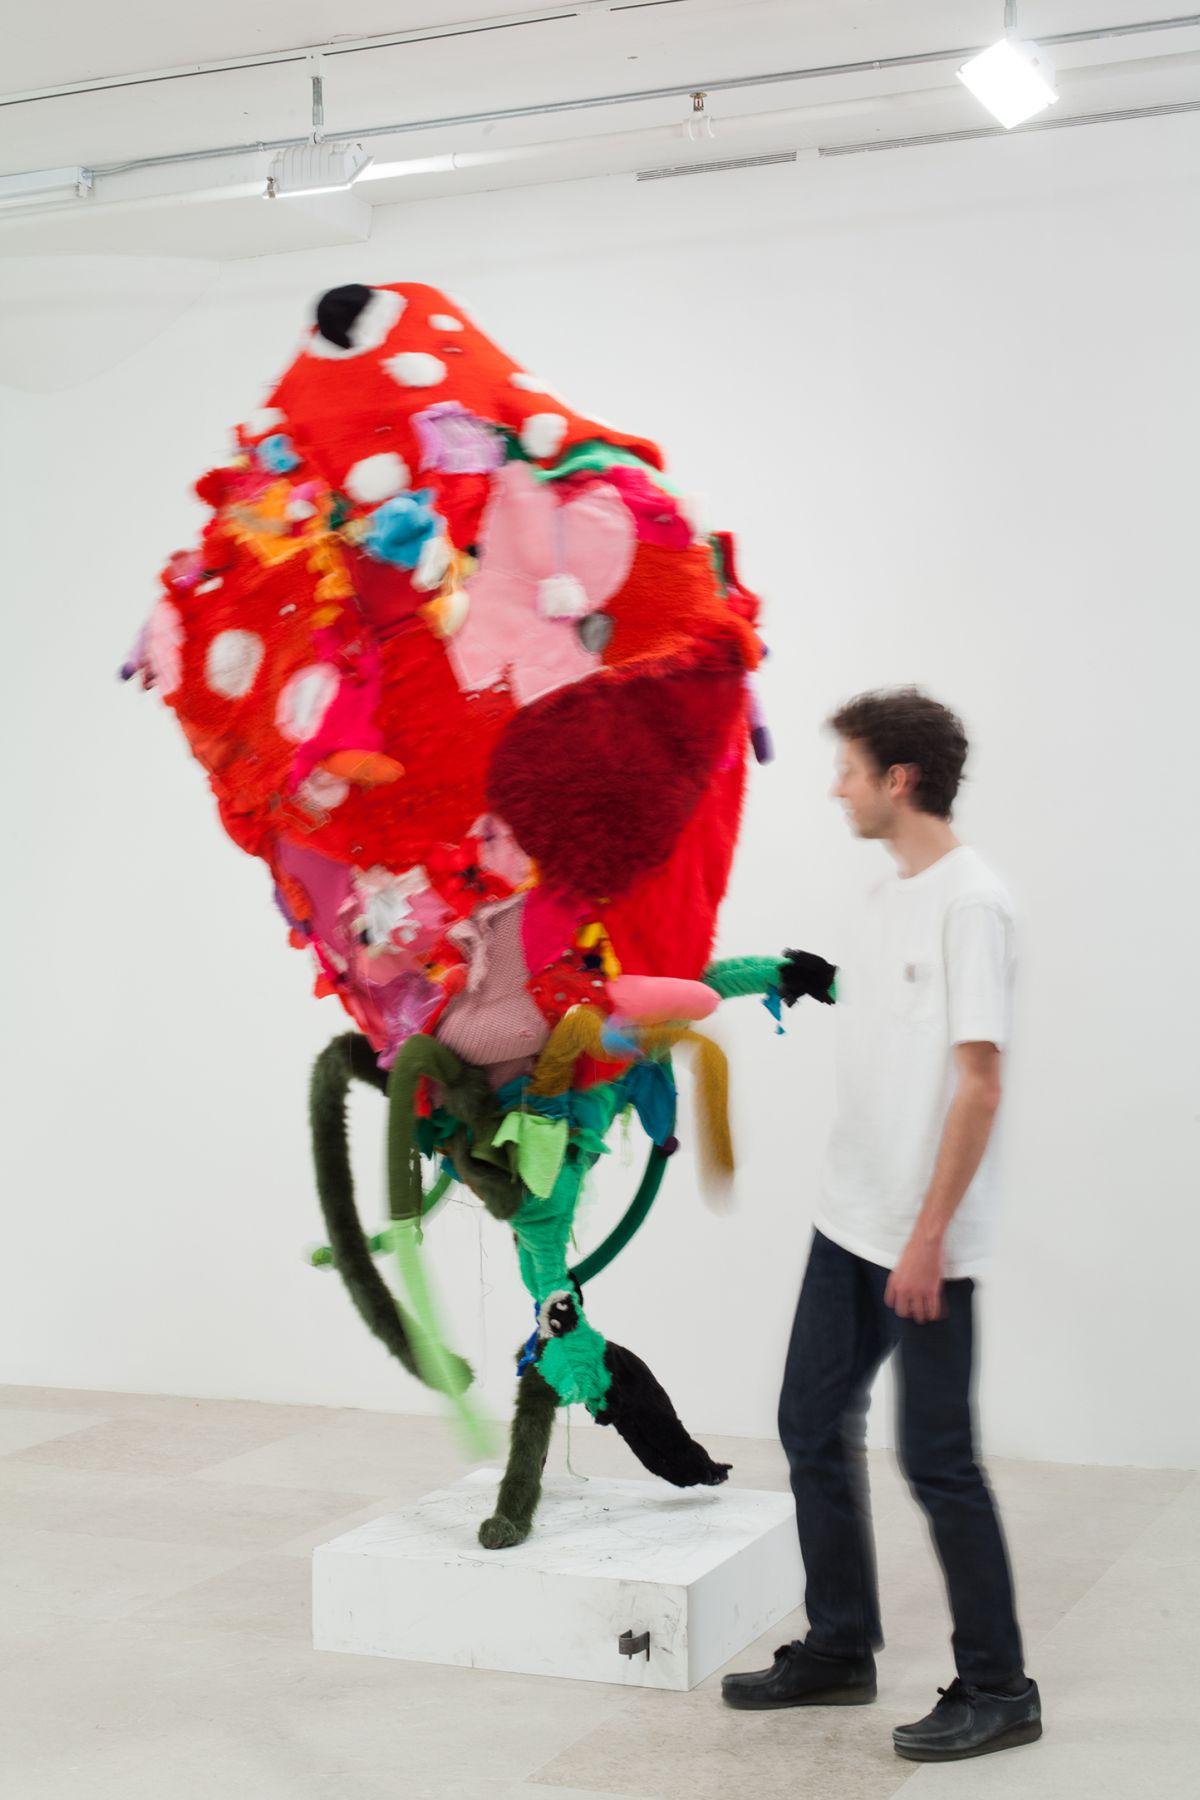 Gelitin, Strawberry, 2012, Mixed media, 110 x 85 x 76 inches